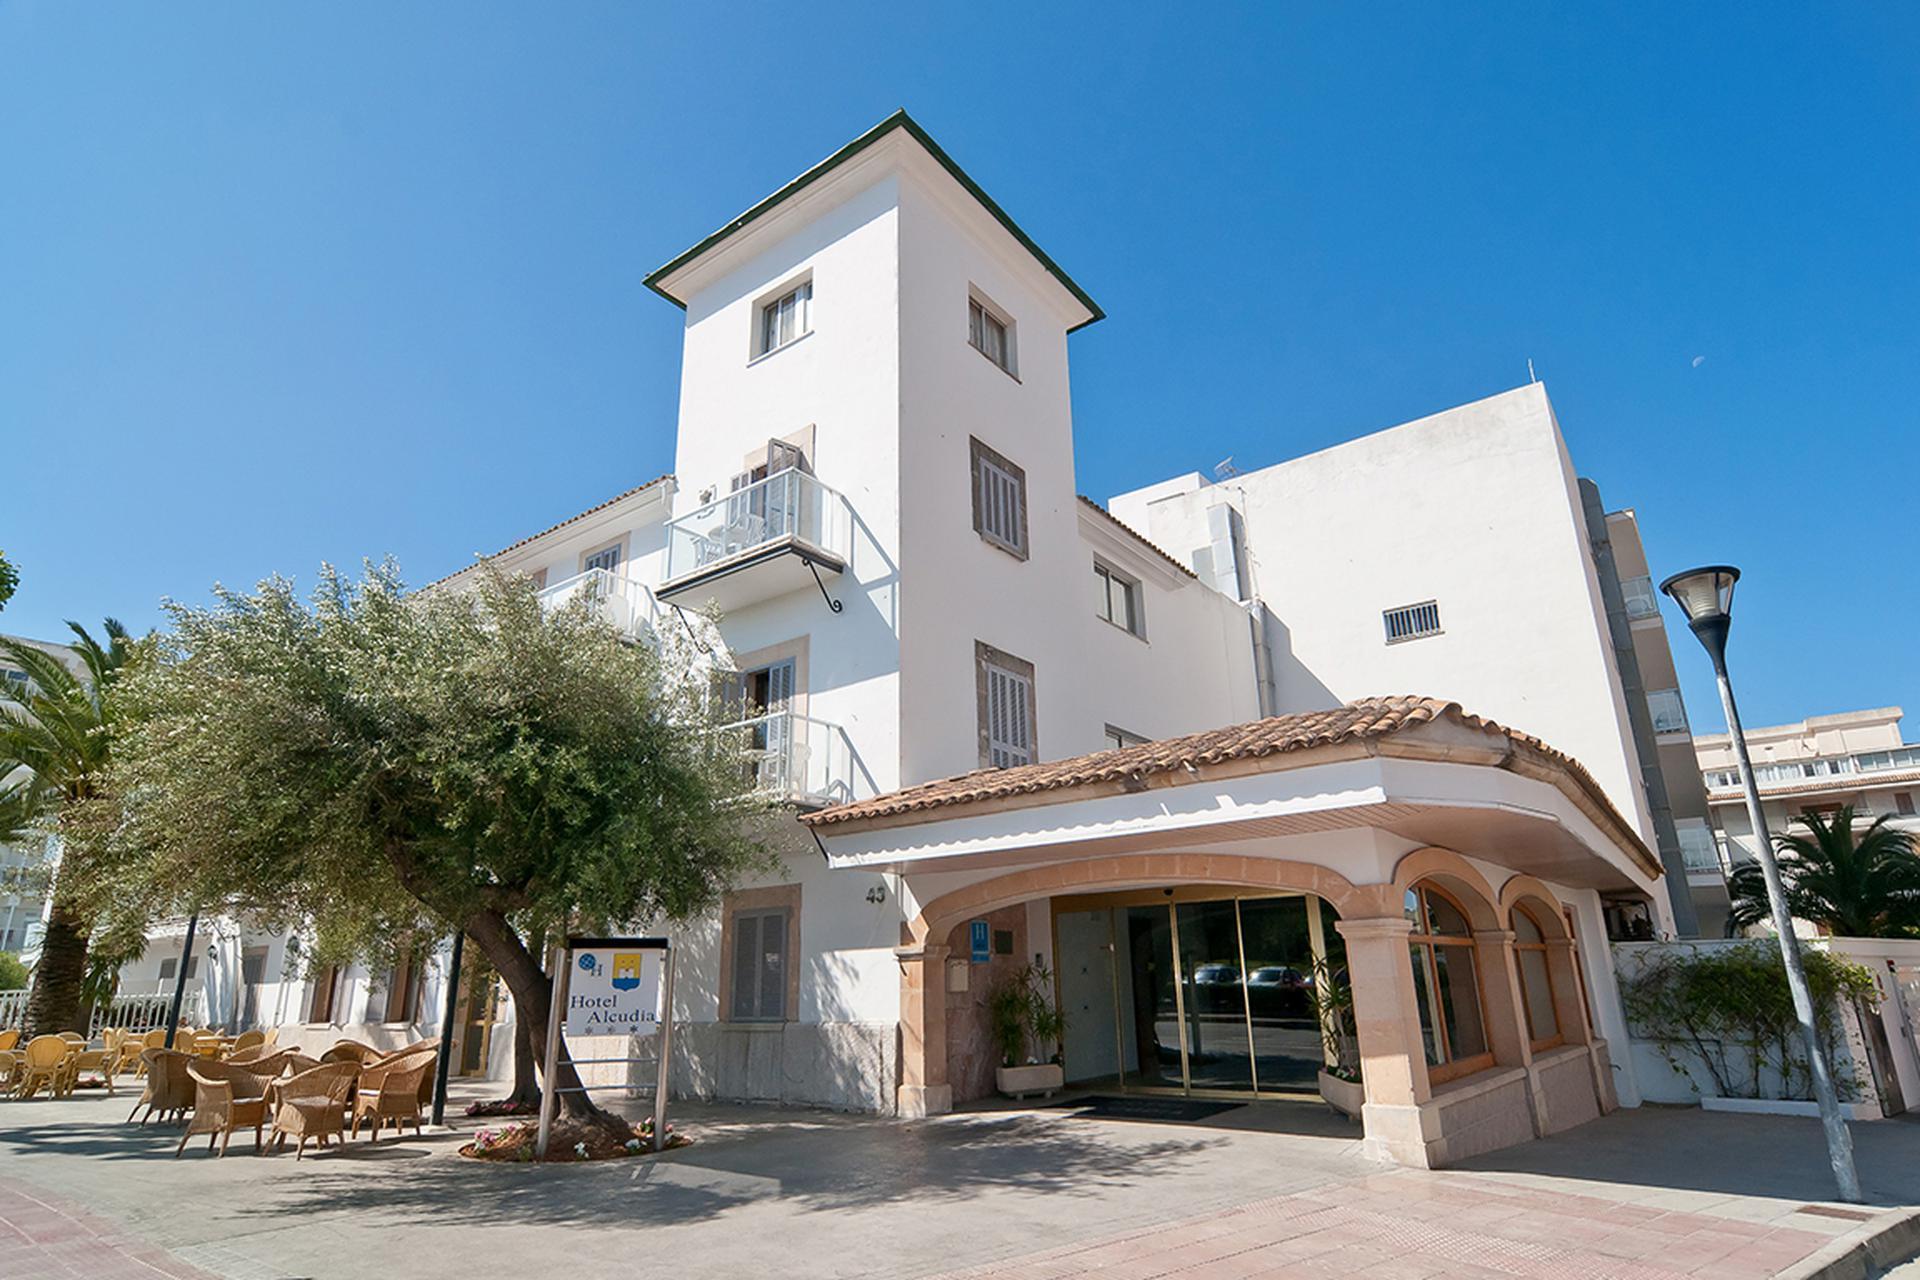 Eix Alcudia Hotel**** i Mallorca, Spanien | Sunweb